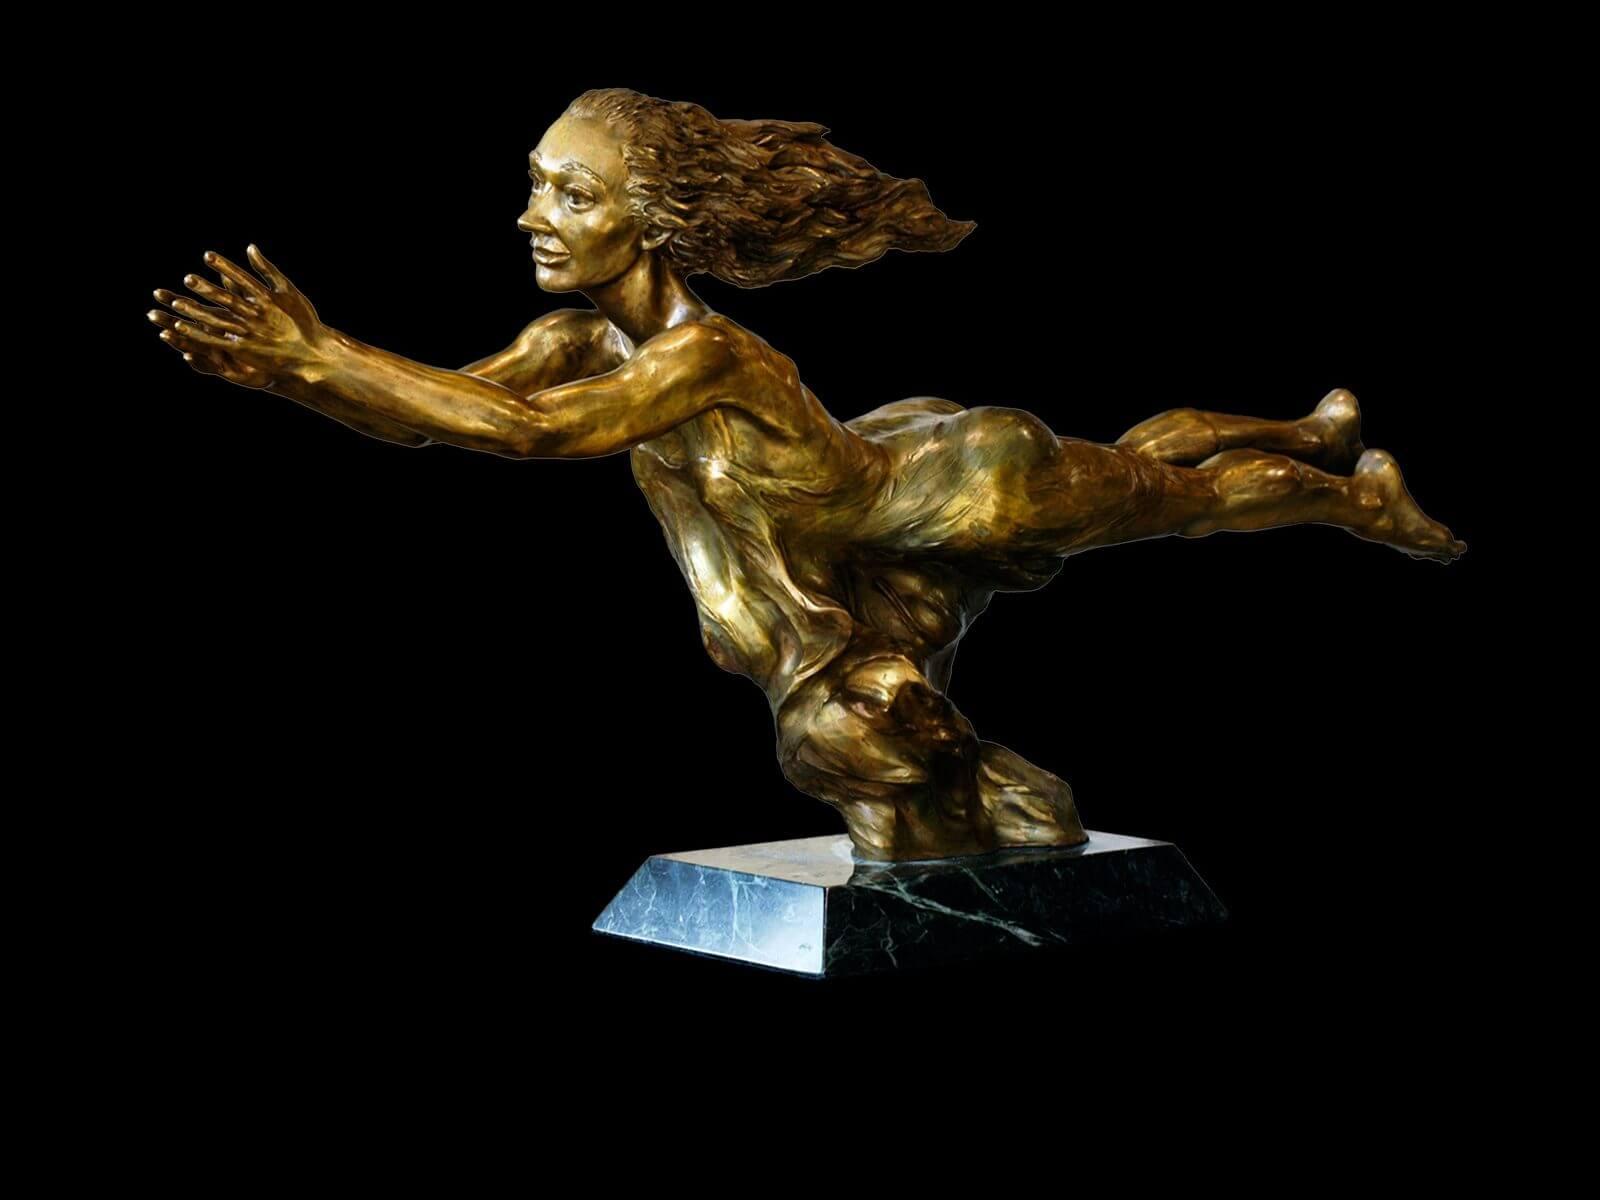 Nimue a figurative bronze sculpture by sculptor Andrew DeVries